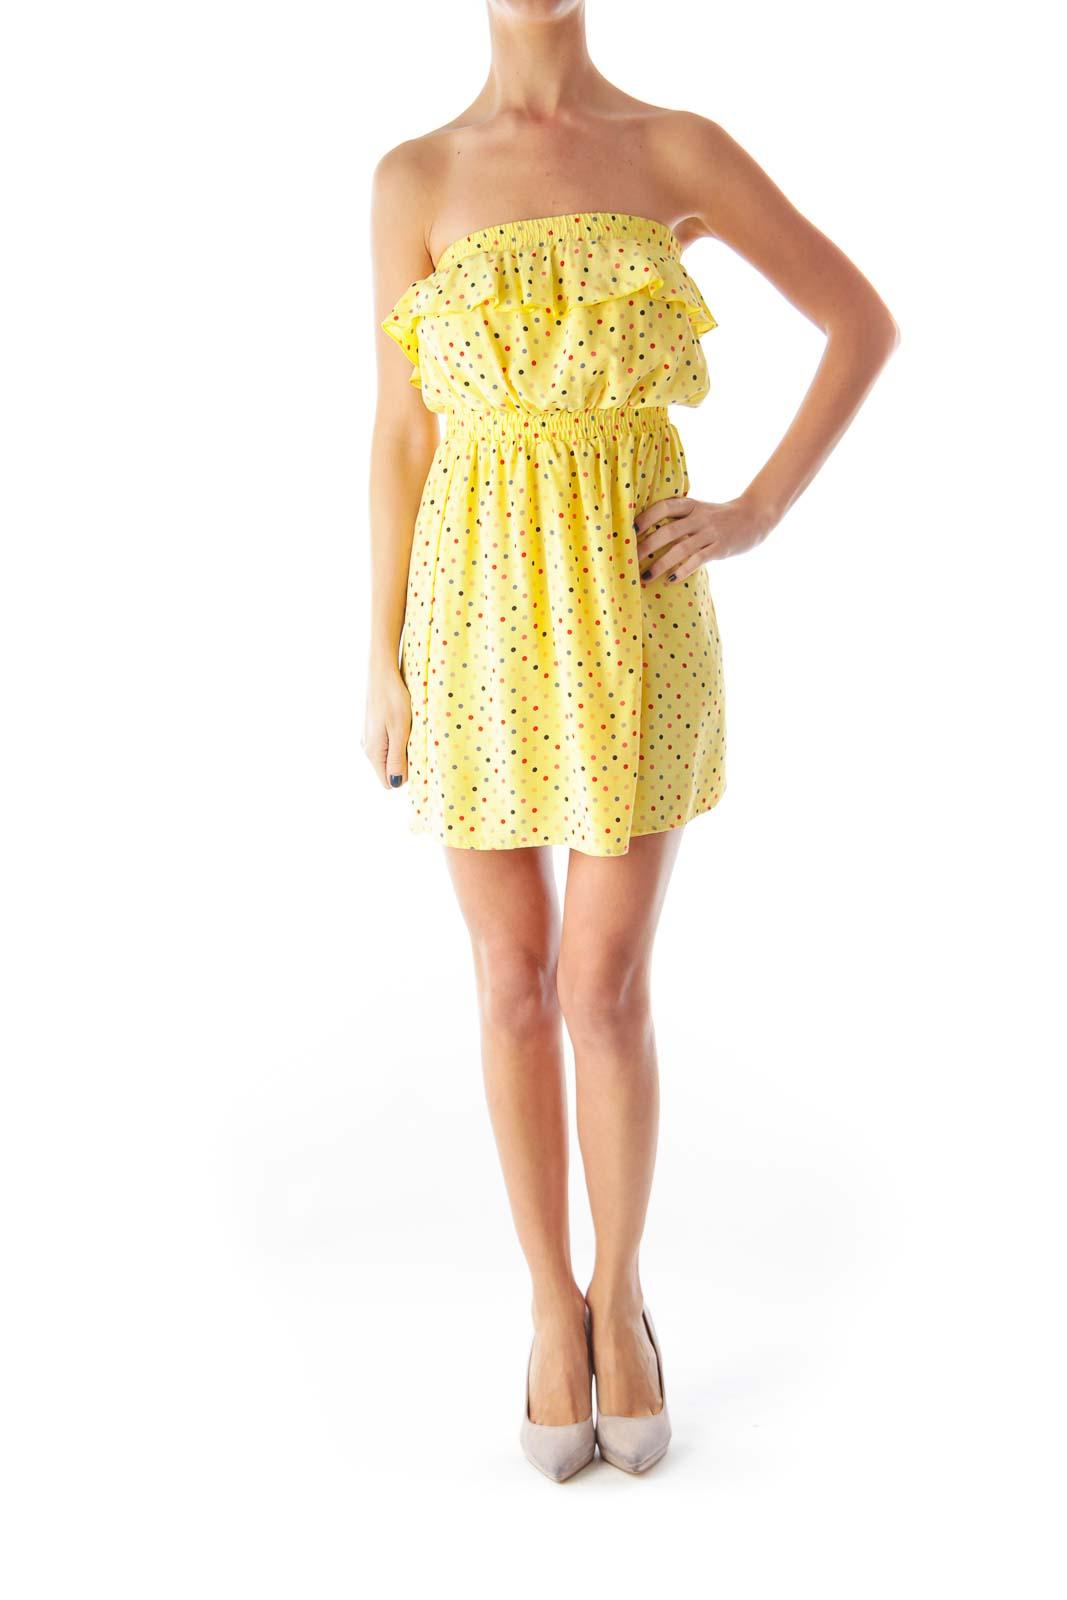 Yellow Polka Dot Strapless Dress